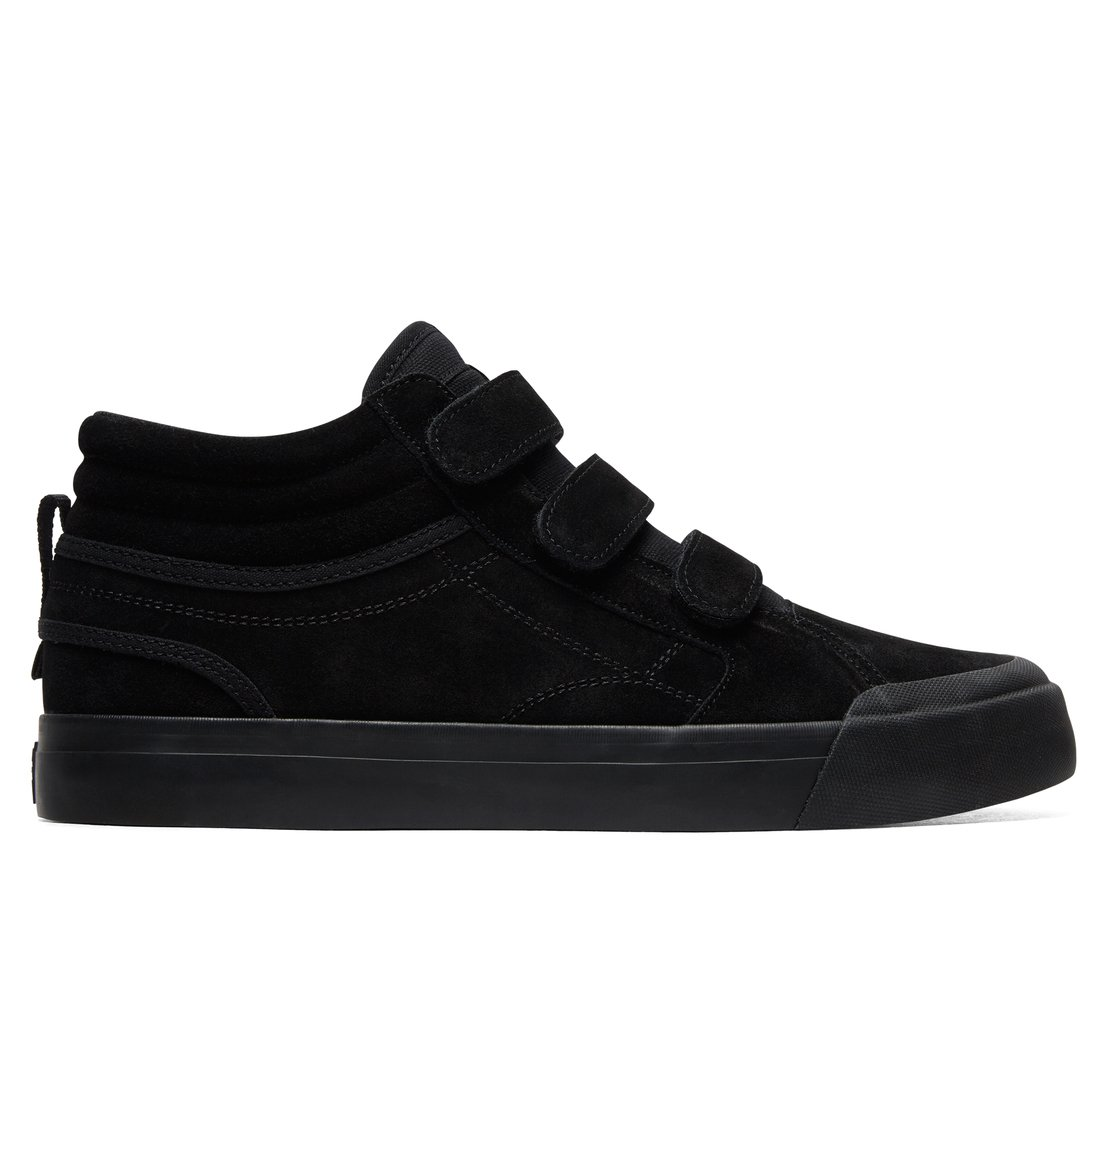 0bffa30ae28 DC Shoes™ Evan Smith Hi V S High-Top Skate Shoes ADYS300523